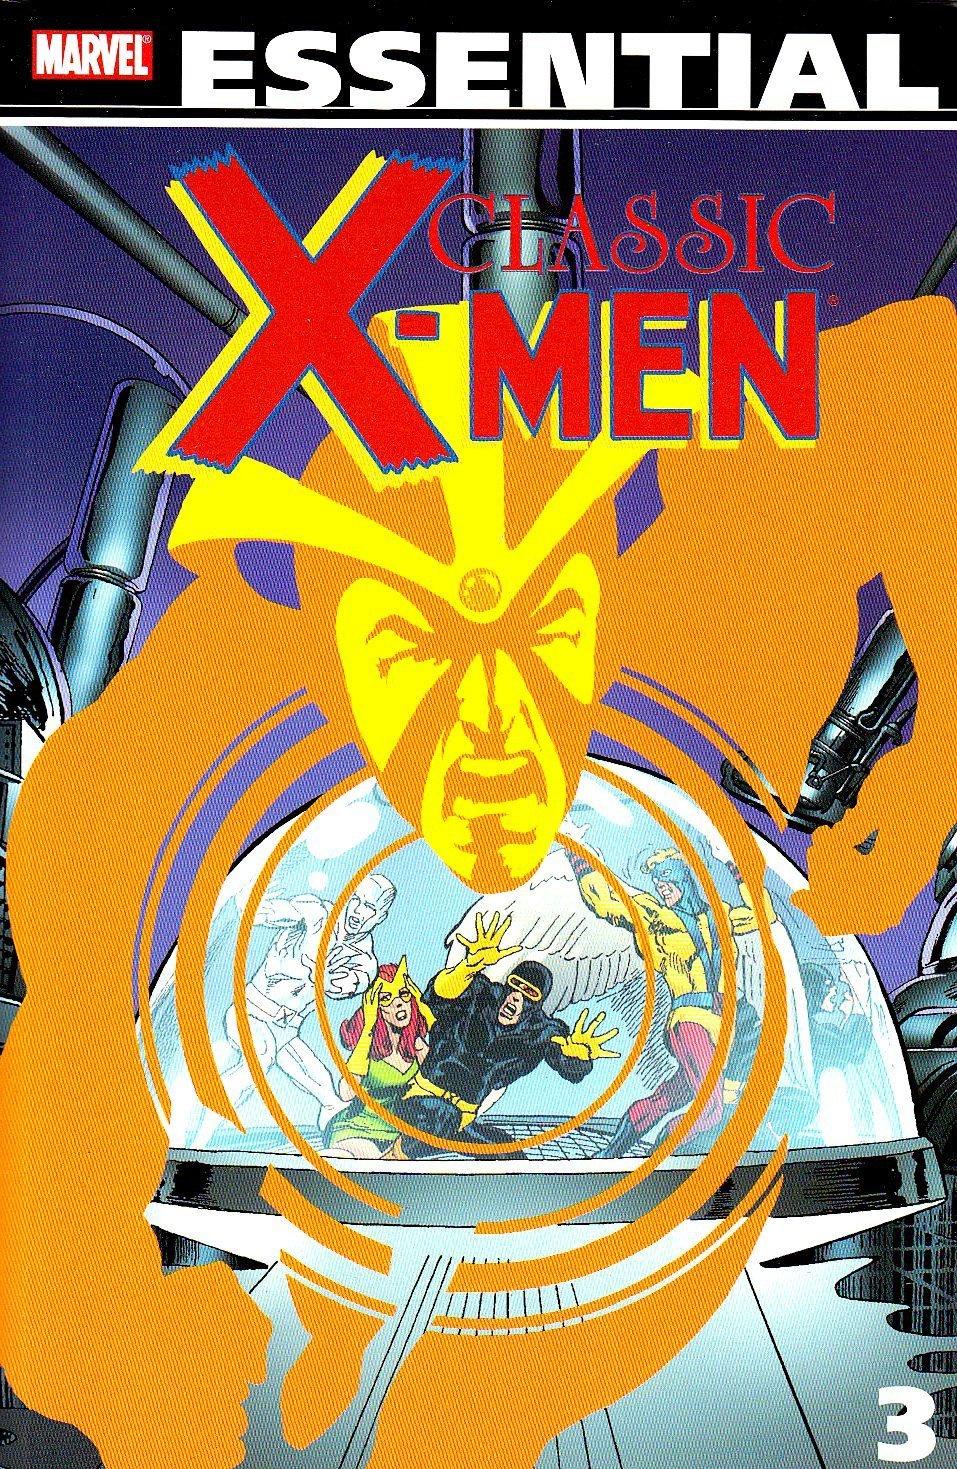 Read Online Essential Classic X-Men, Vol. 3 (Marvel Essentials) pdf epub